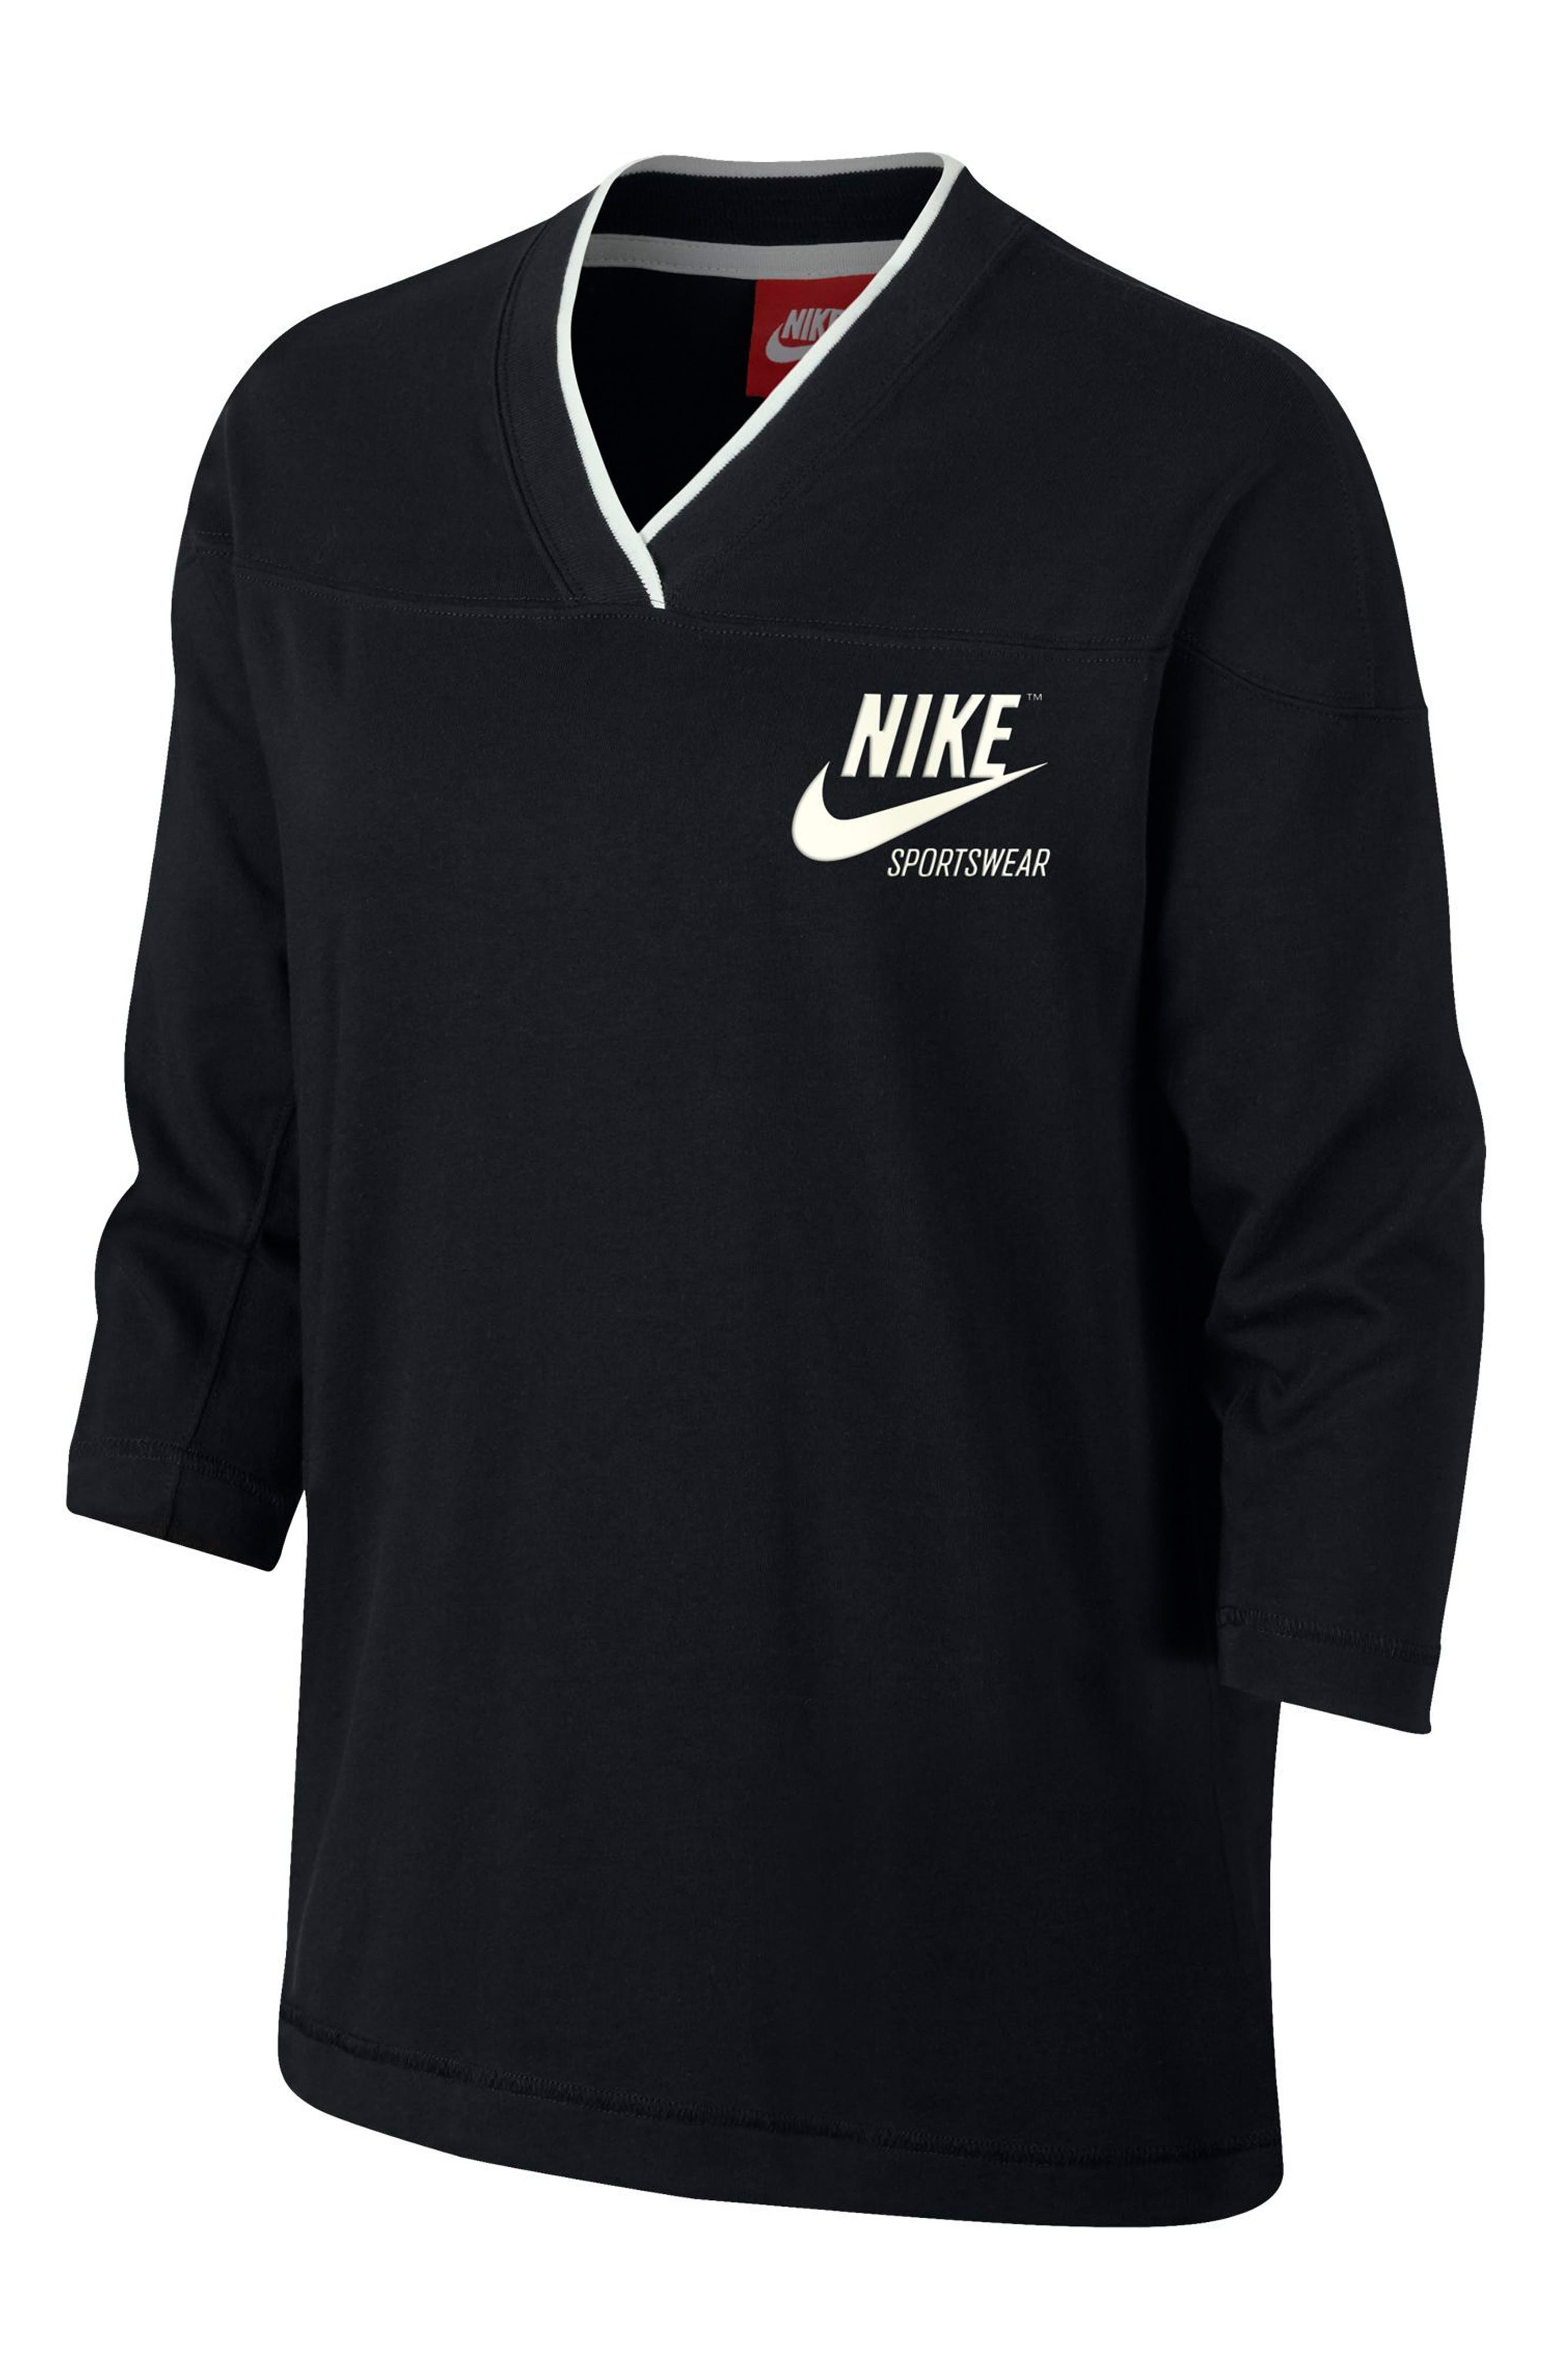 Sportswear Women's V-Neck Top,                         Main,                         color, Black/ Sail